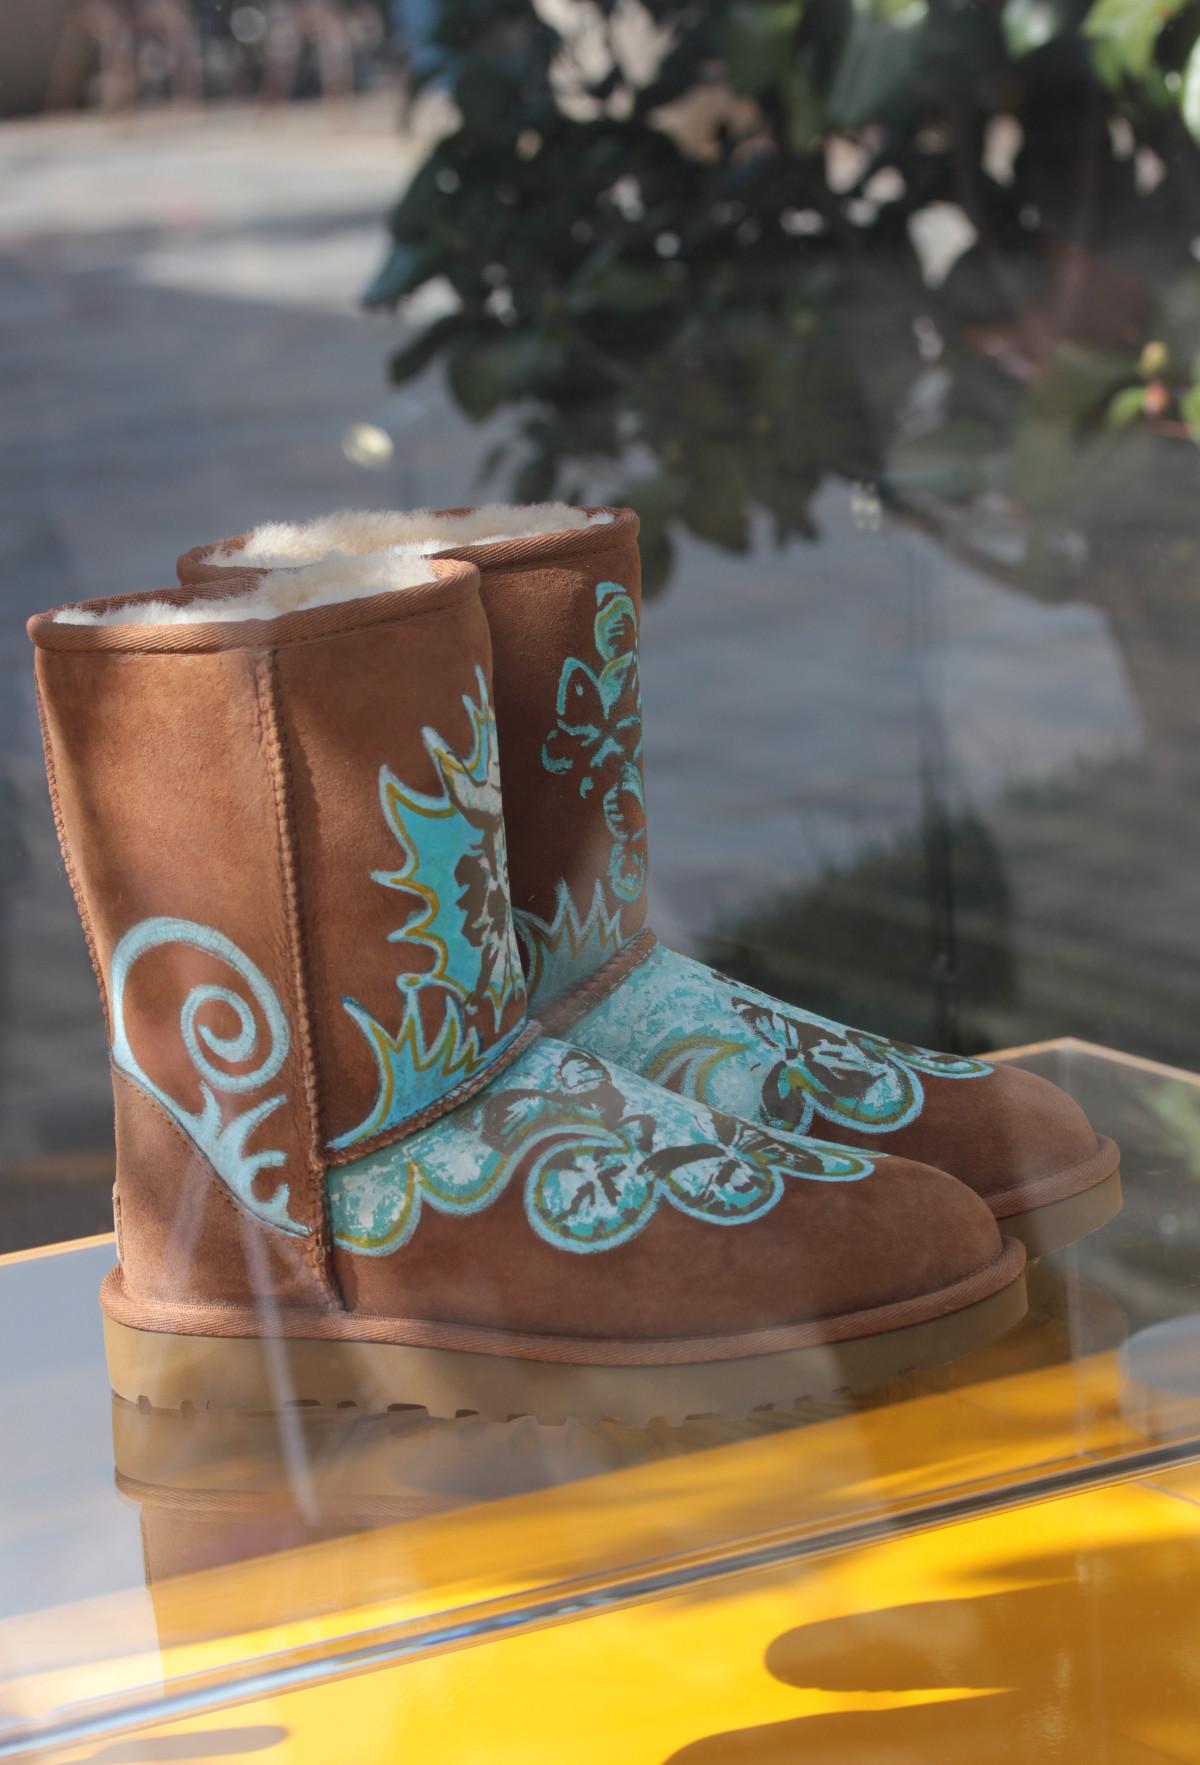 La_Vallee_Village-FashionmeetsArt-Outlet-StreetArt_event-UGG-Shoes-IZA_ZARO-Customisation